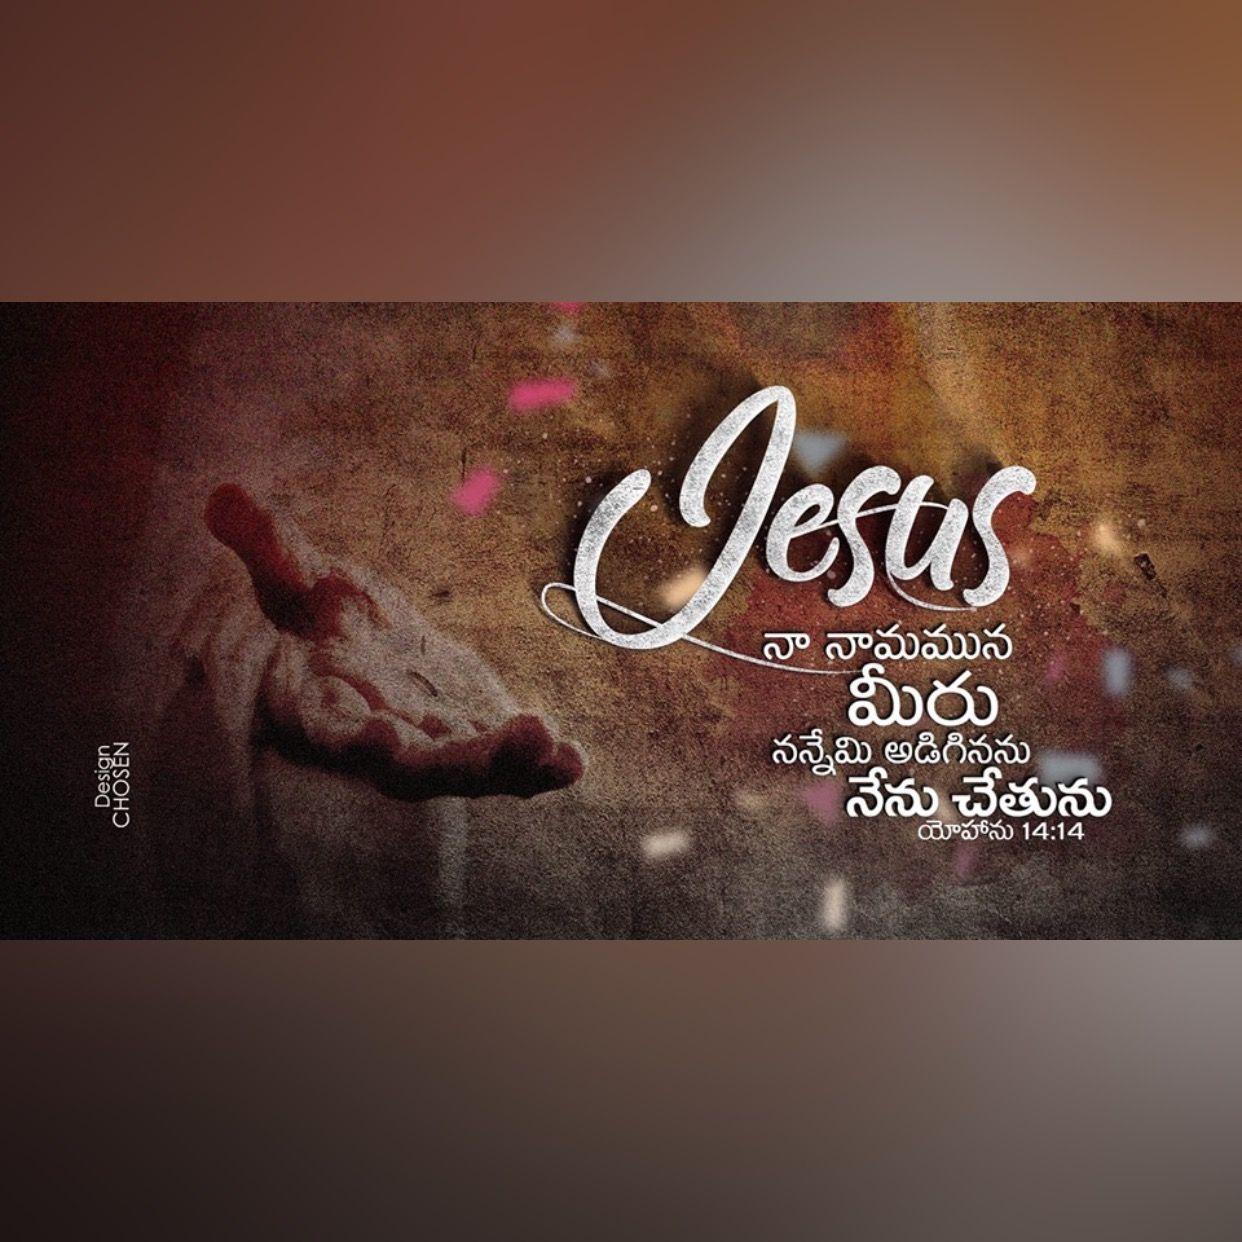 Pin by V.Anu on ♥️jᎬsus mᎪssᎪᎶᎬ Bible quotes telugu